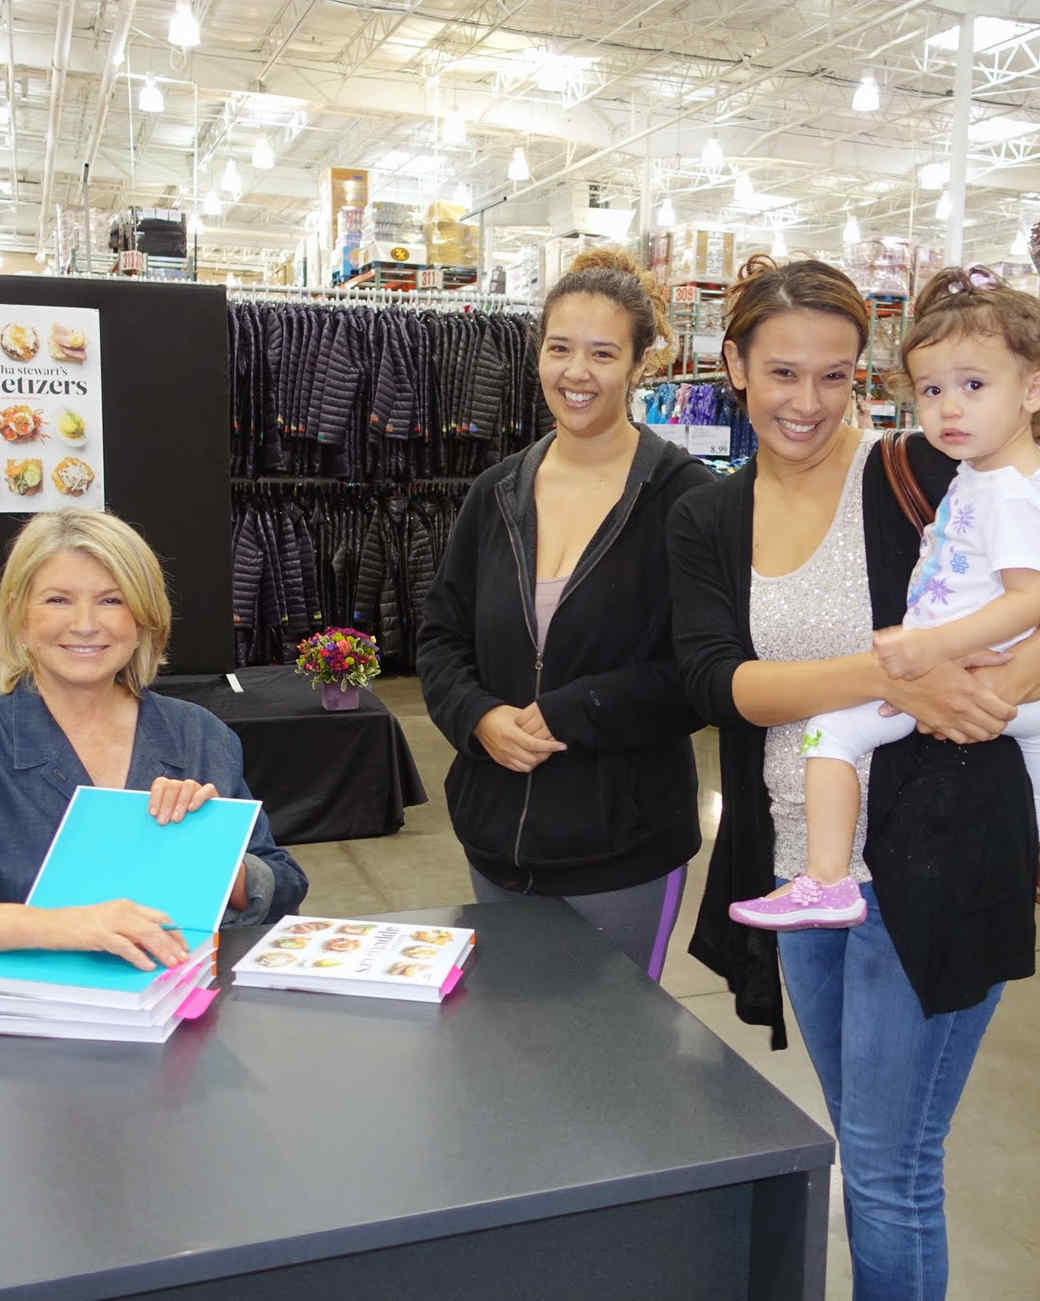 book-signing-costco-10.jpg